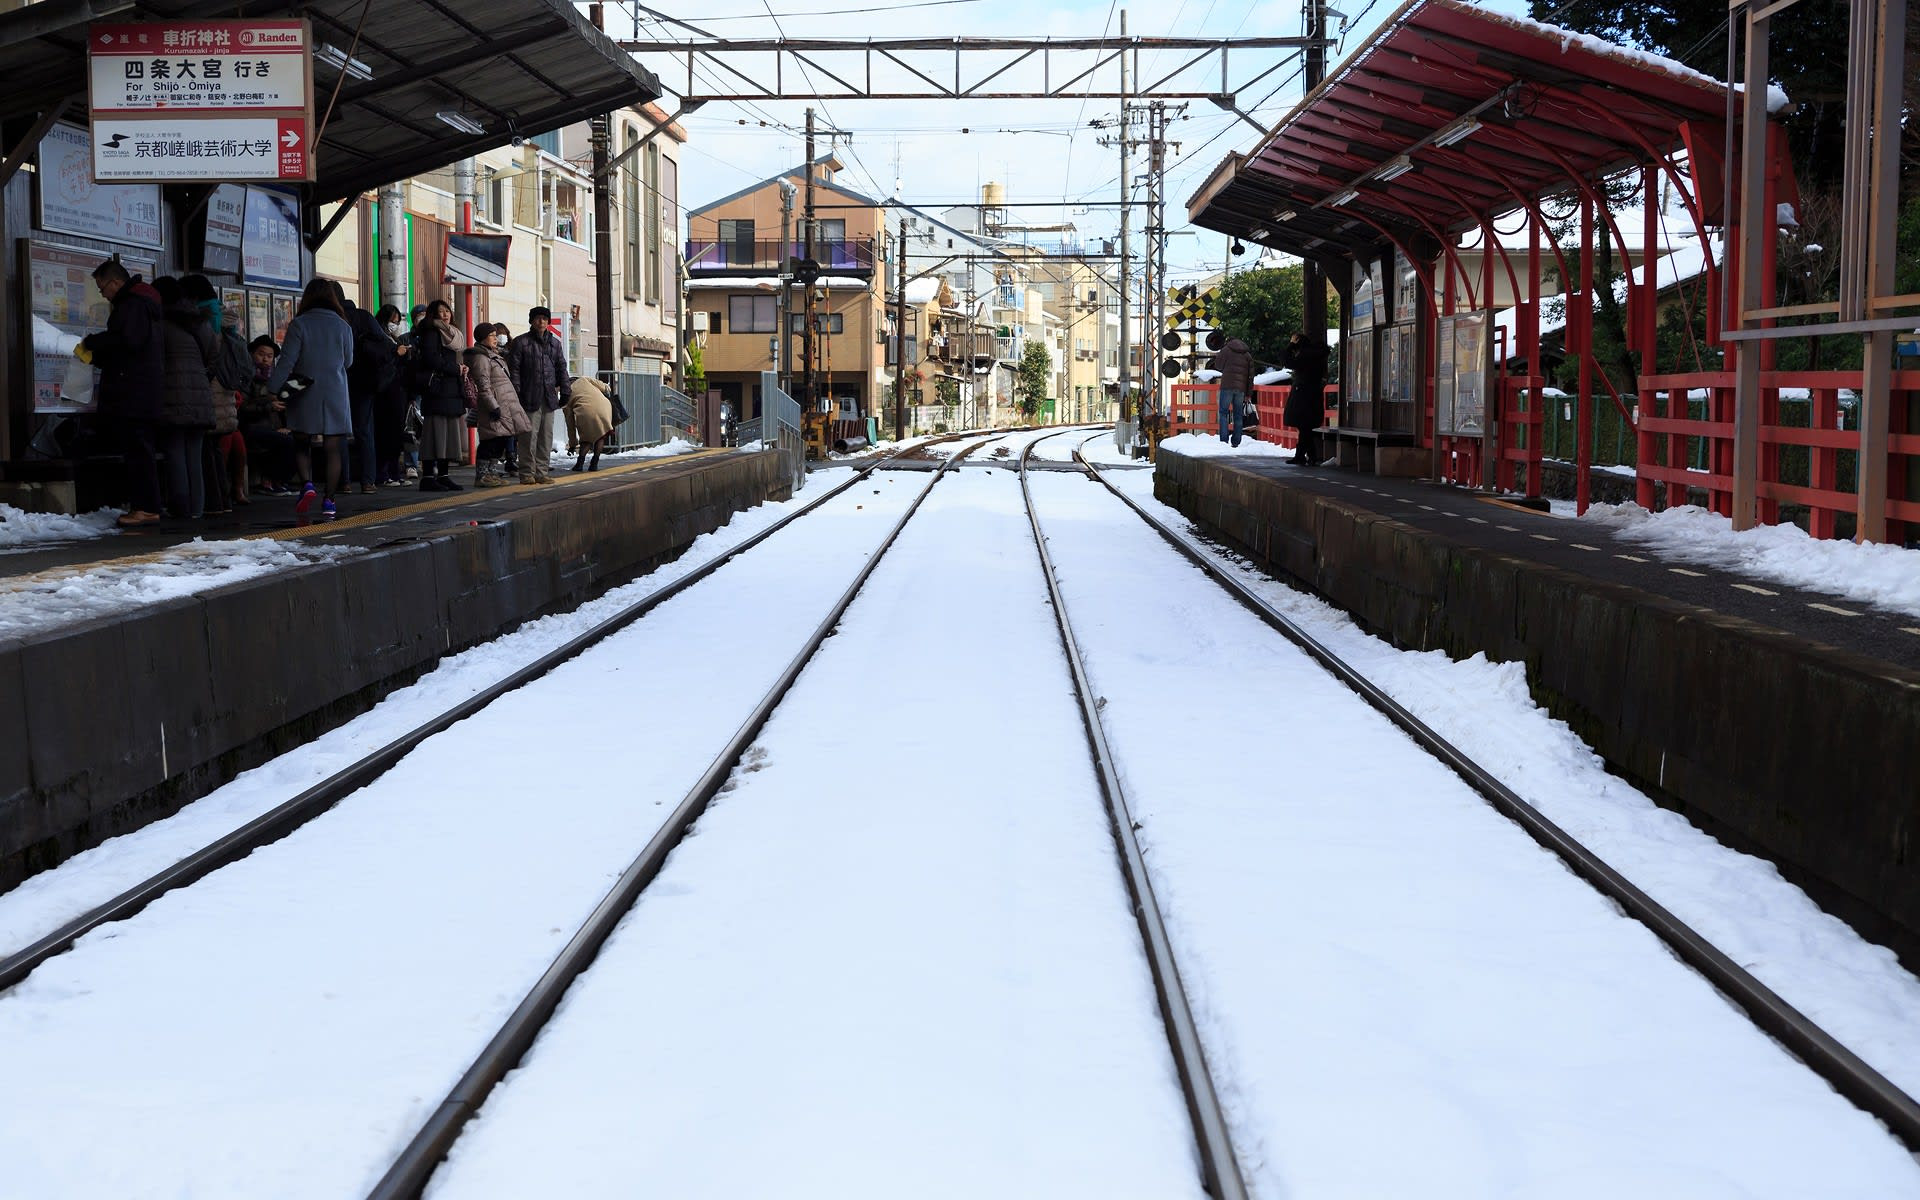 2015年雪の京都 嵐電の壁紙 計17枚 壁紙 日々駄文